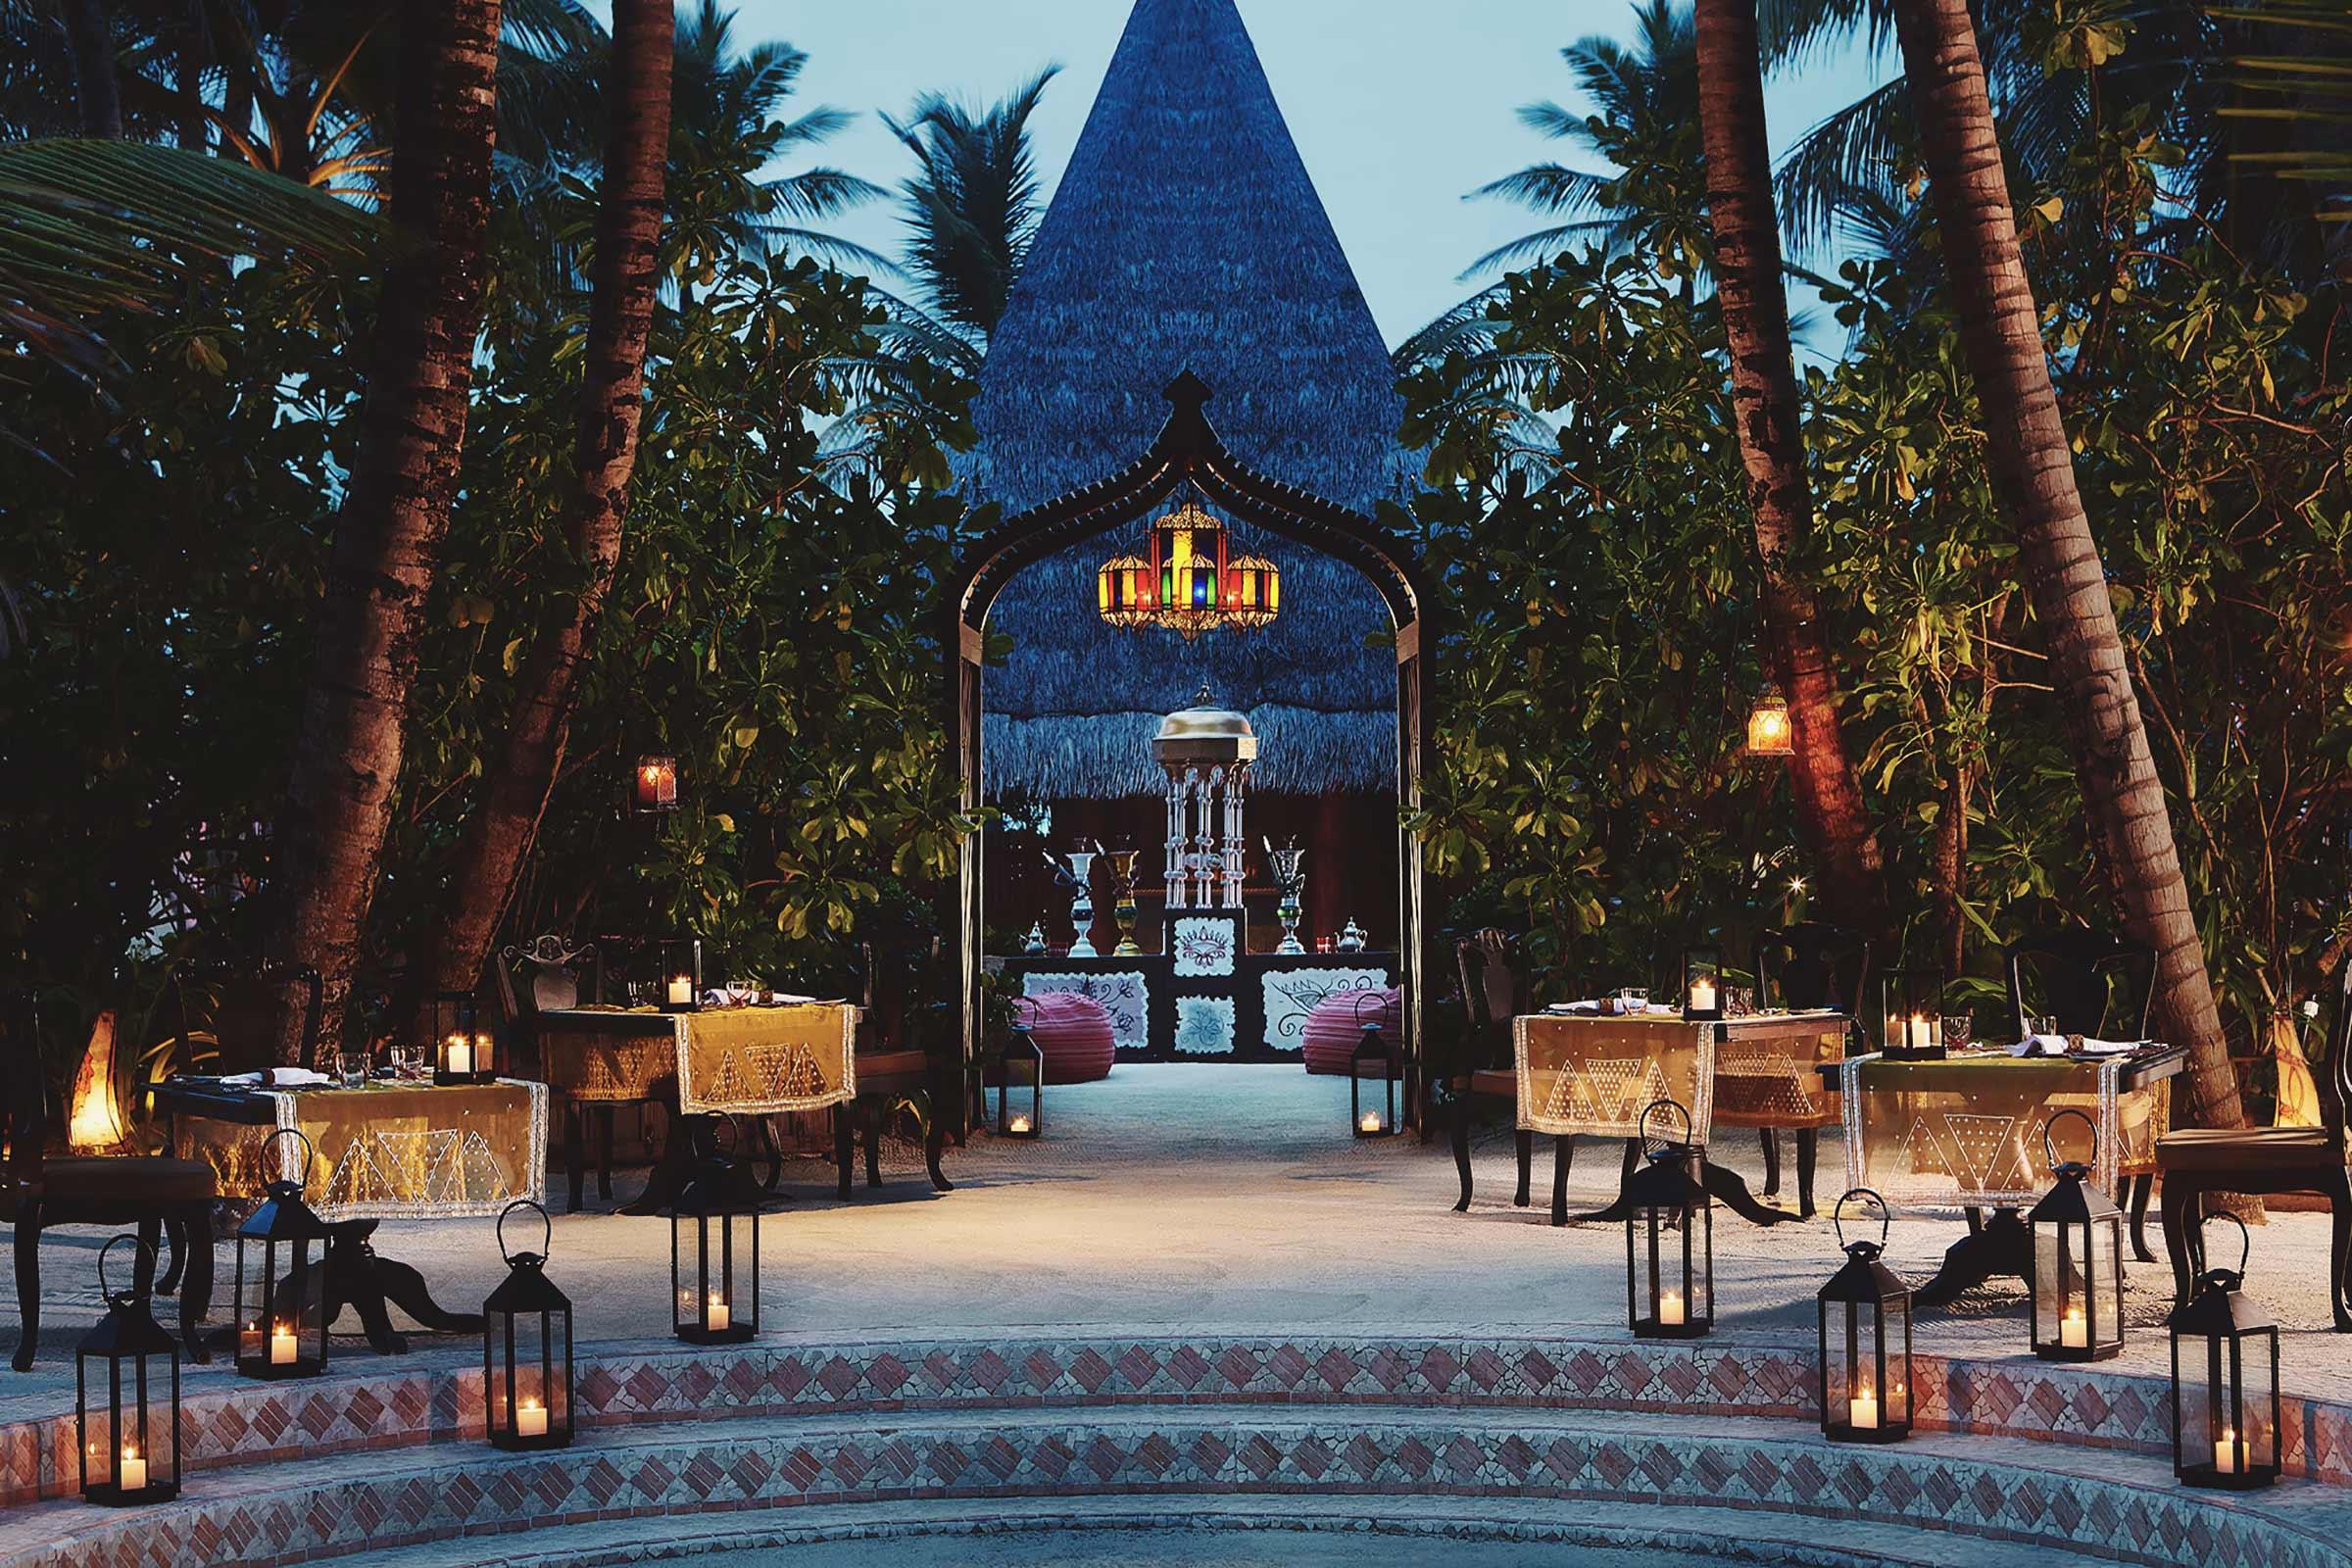 OO_ReethiRah_Fanditha_Resturant-1.jpg